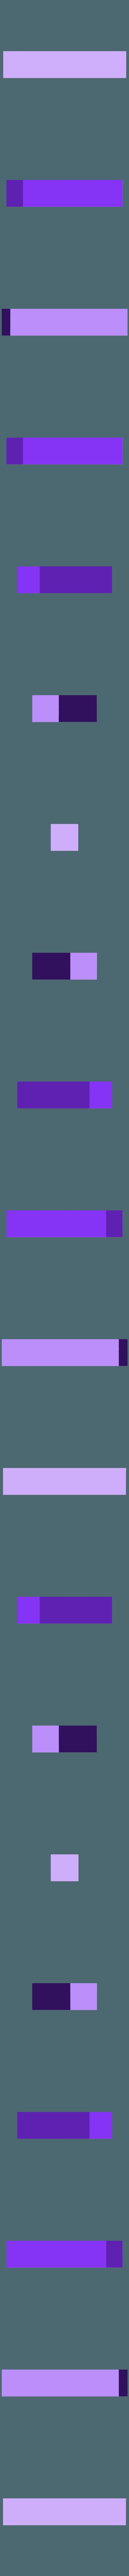 6_Pin_Legs.stl Download free STL file Flexi Godzilla • 3D printable object, dancingchicken